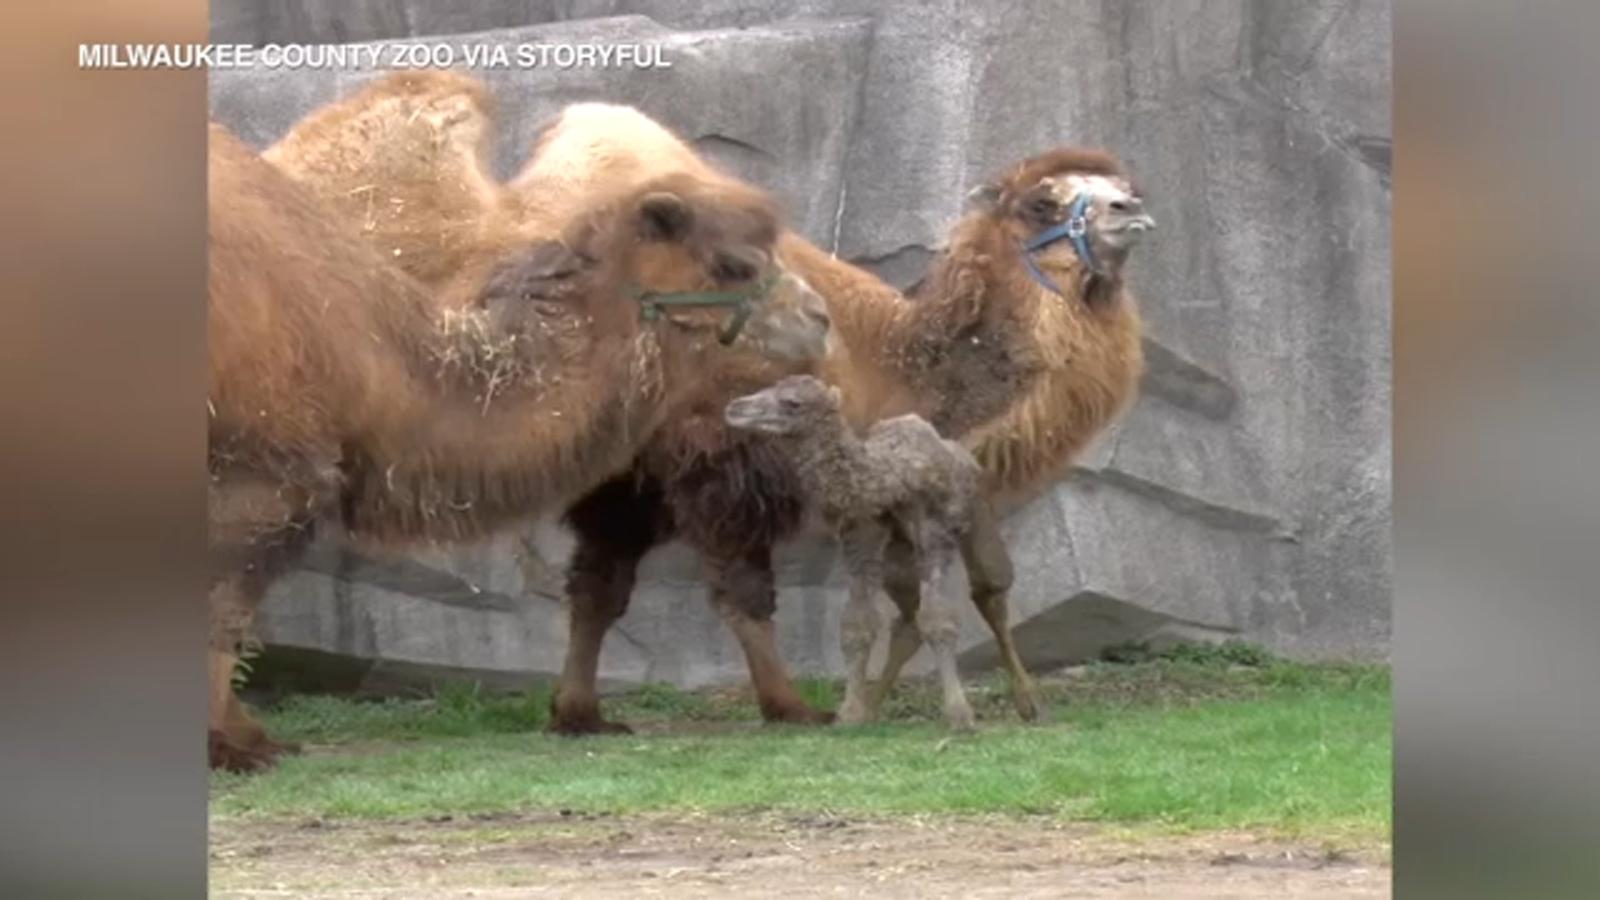 Newborn camel explores habitat with parents at Milwaukee Zoo